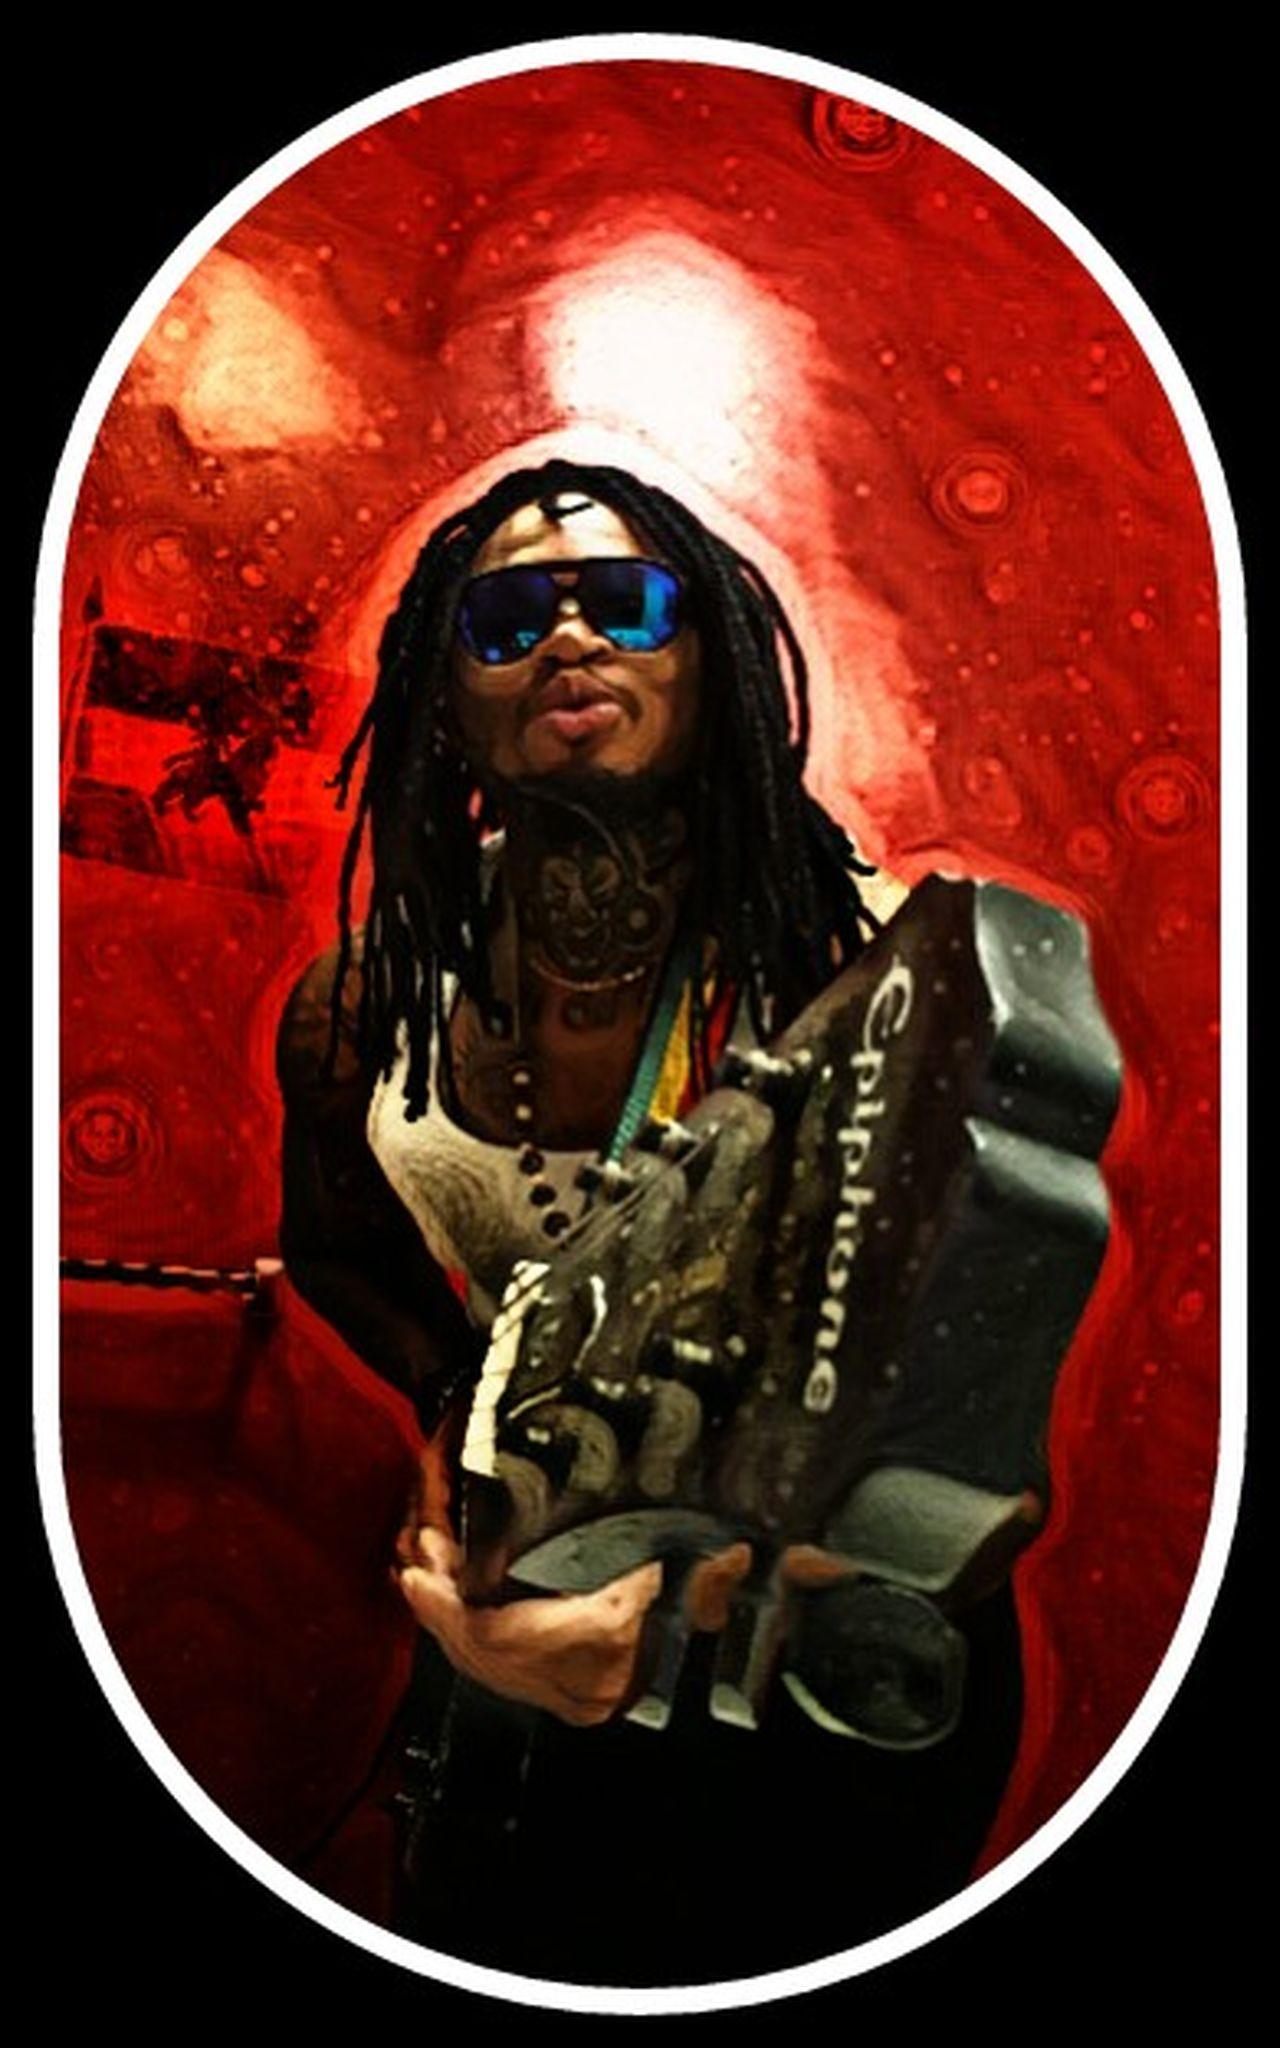 I n I ah mi dusty chunes People Real People Portrait Taking Photos Badass RastaRude Jamaica Bob Marley Creativity RASTA My Unique Style One Love❤ From My Point Of View Underground Bad Boy  Petertosh ThatsMe